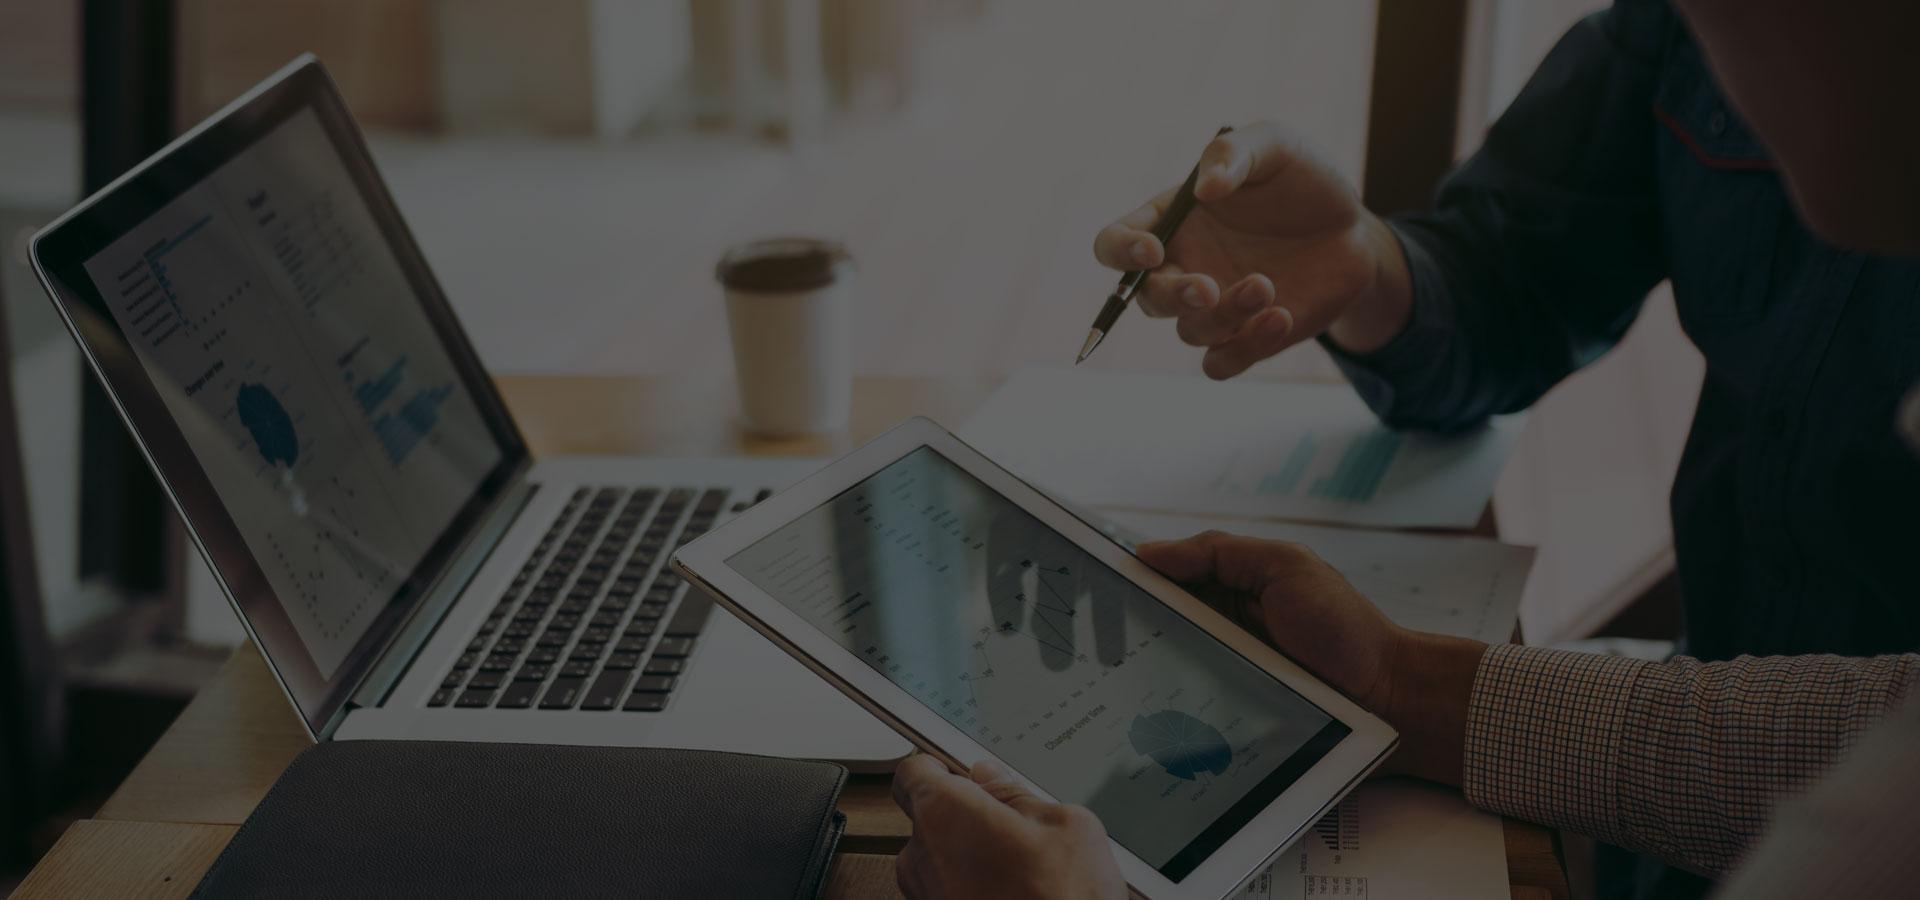 Agence de conseils en stratégies digitales